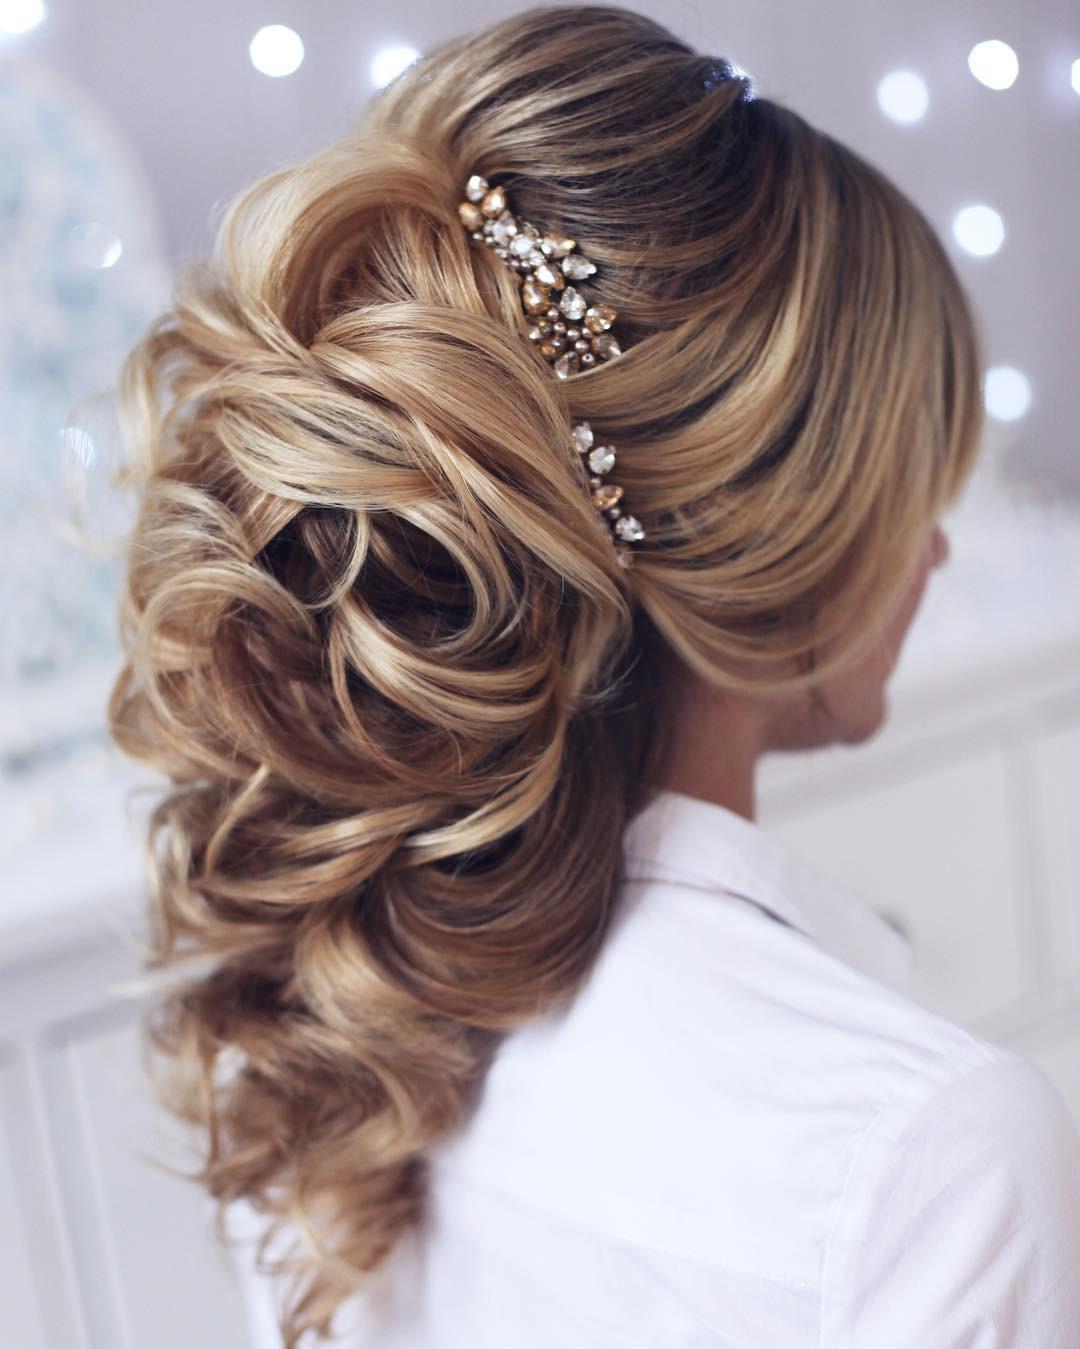 Long Hairstyles For Weddings  10 Lavish Wedding Hairstyles for Long Hair Wedding